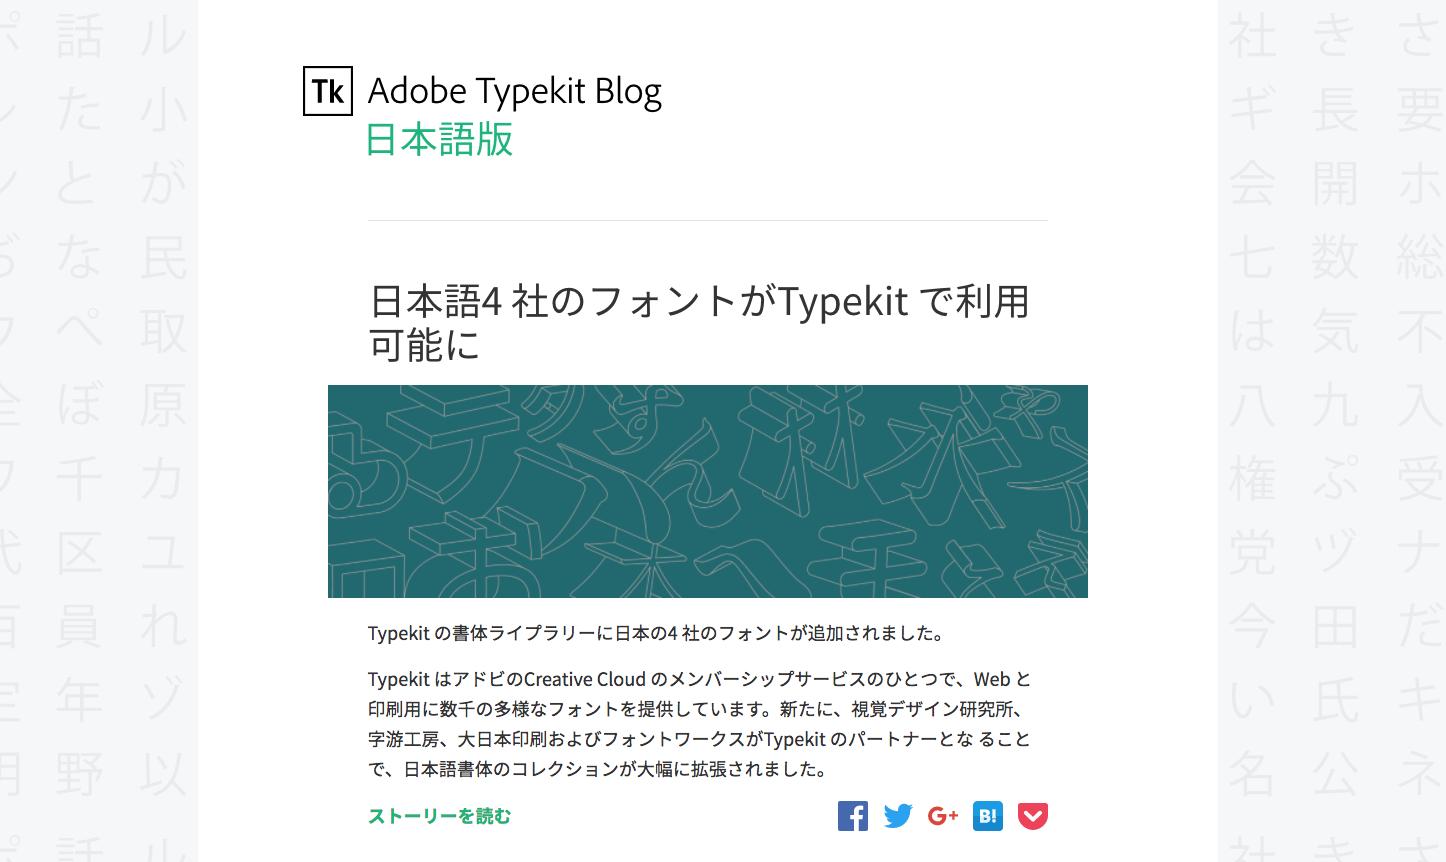 Typekit Japanese blog homepage